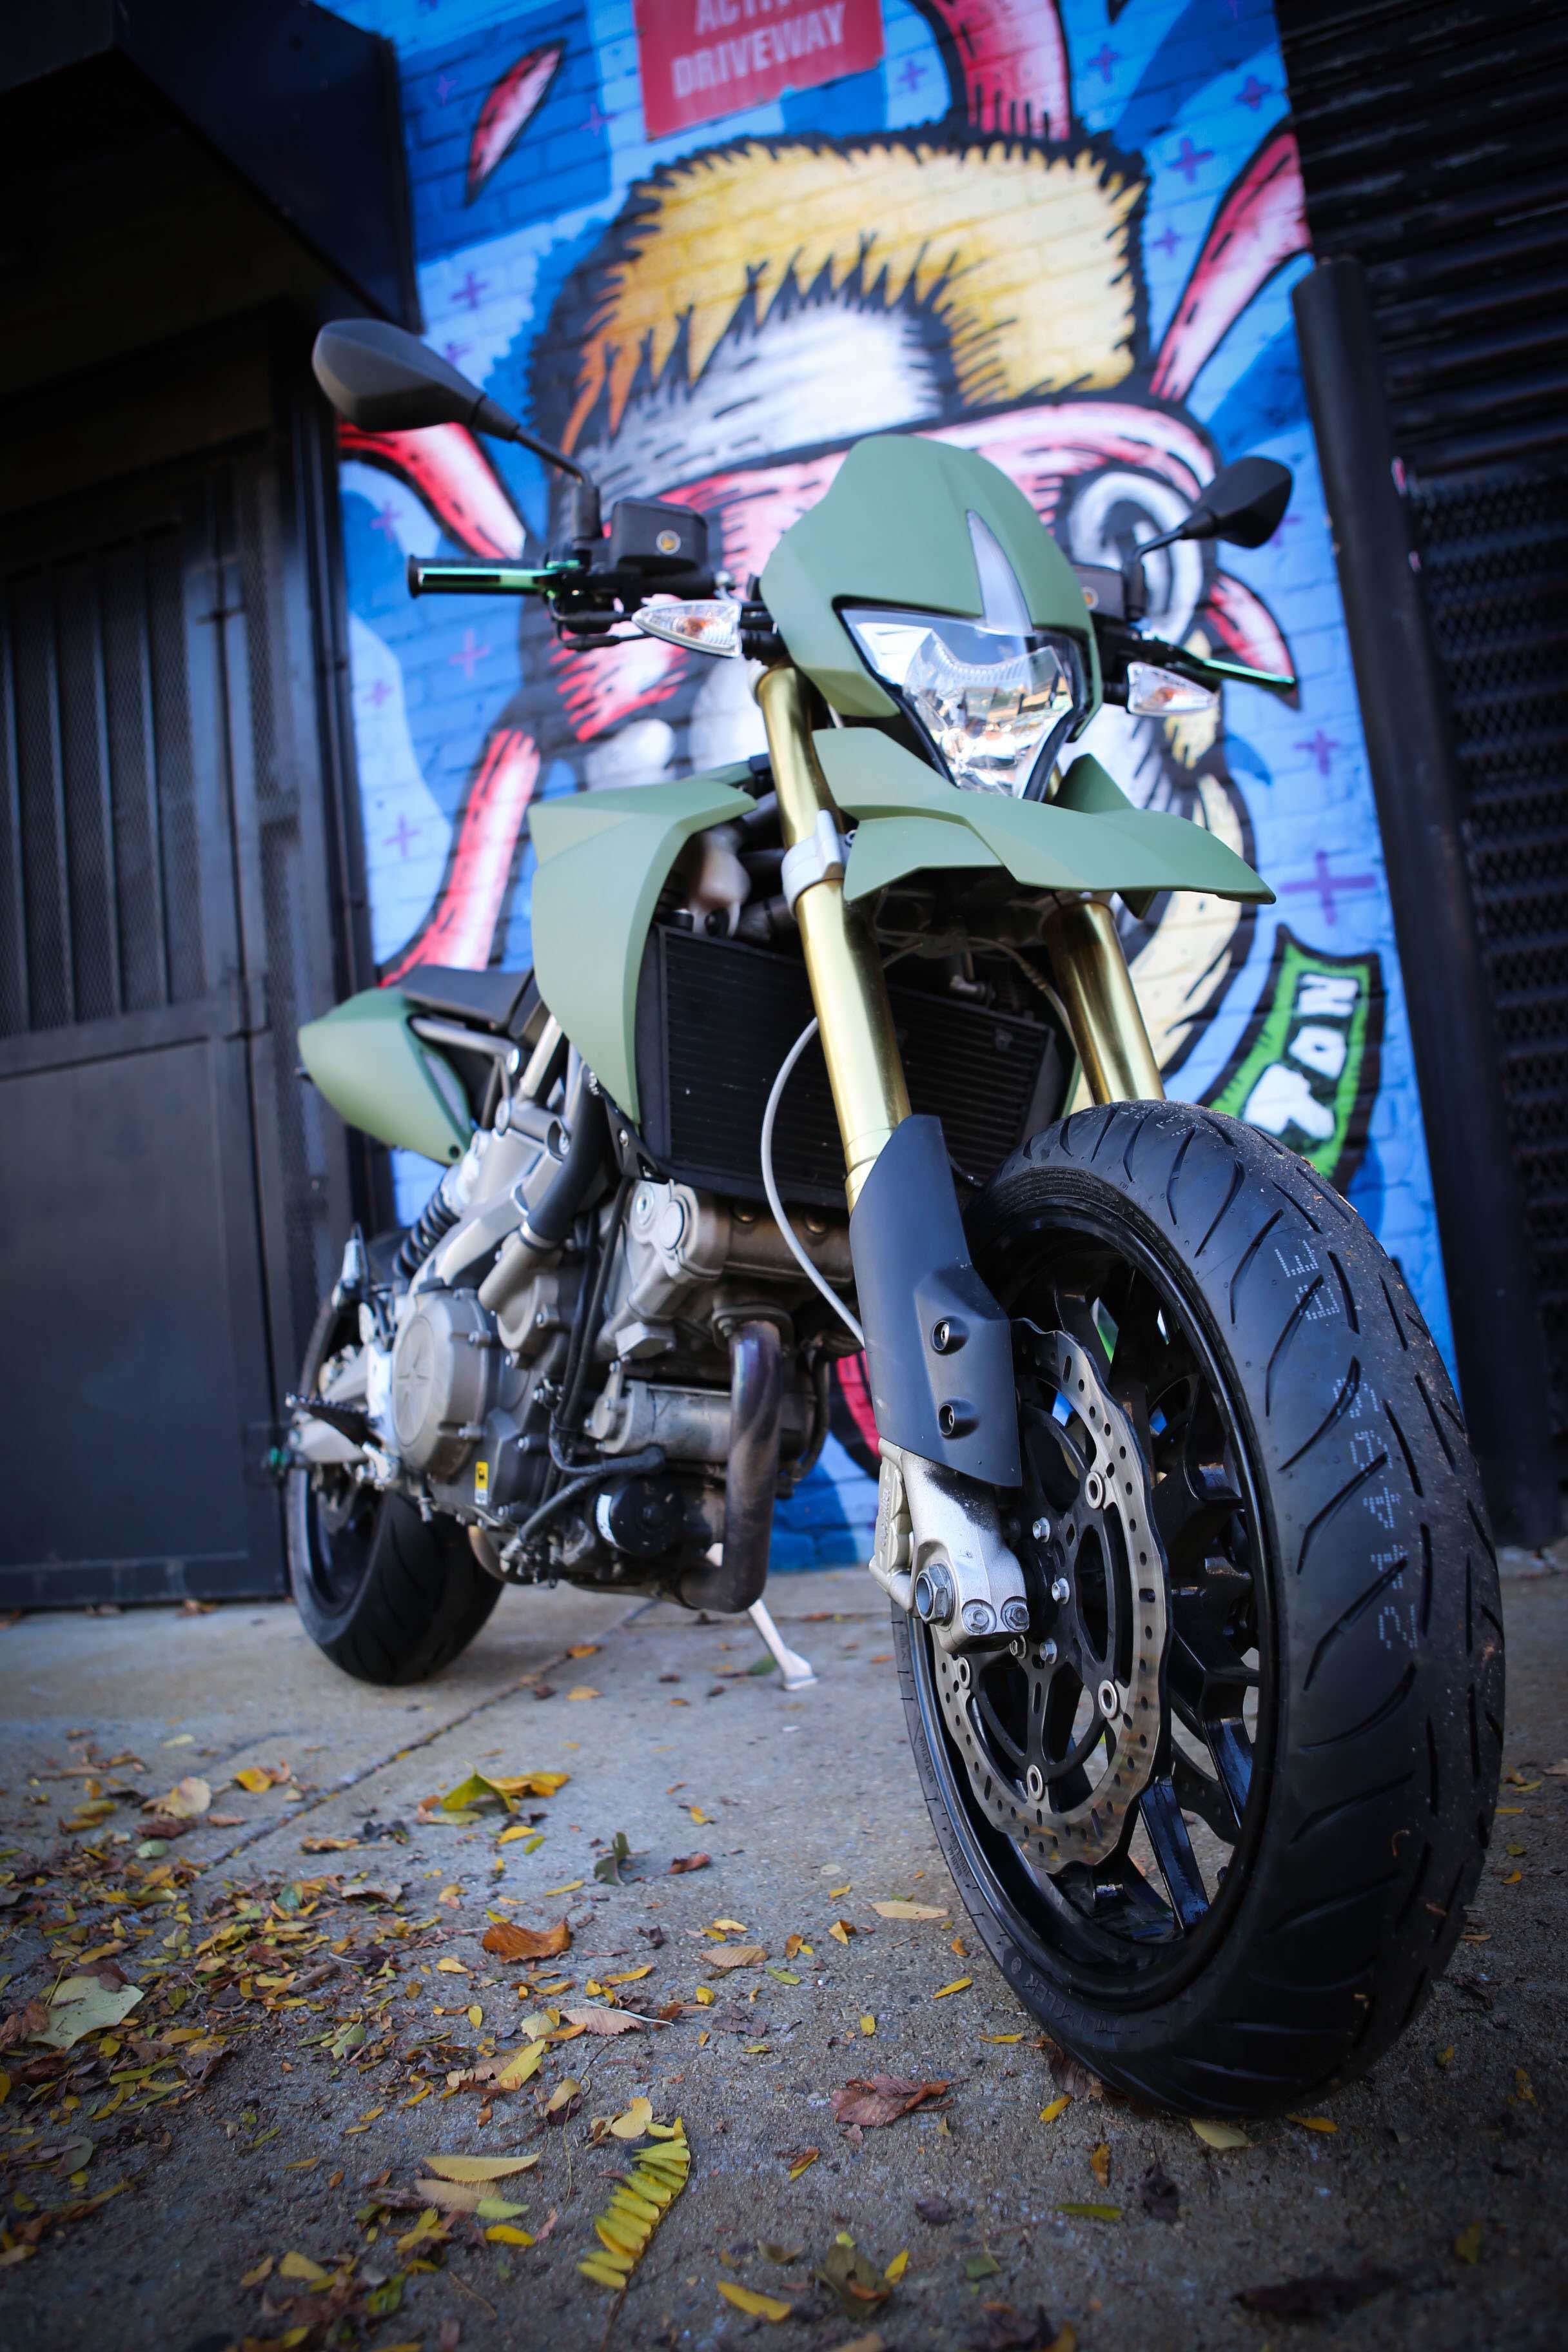 moto3-7 copy.jpg